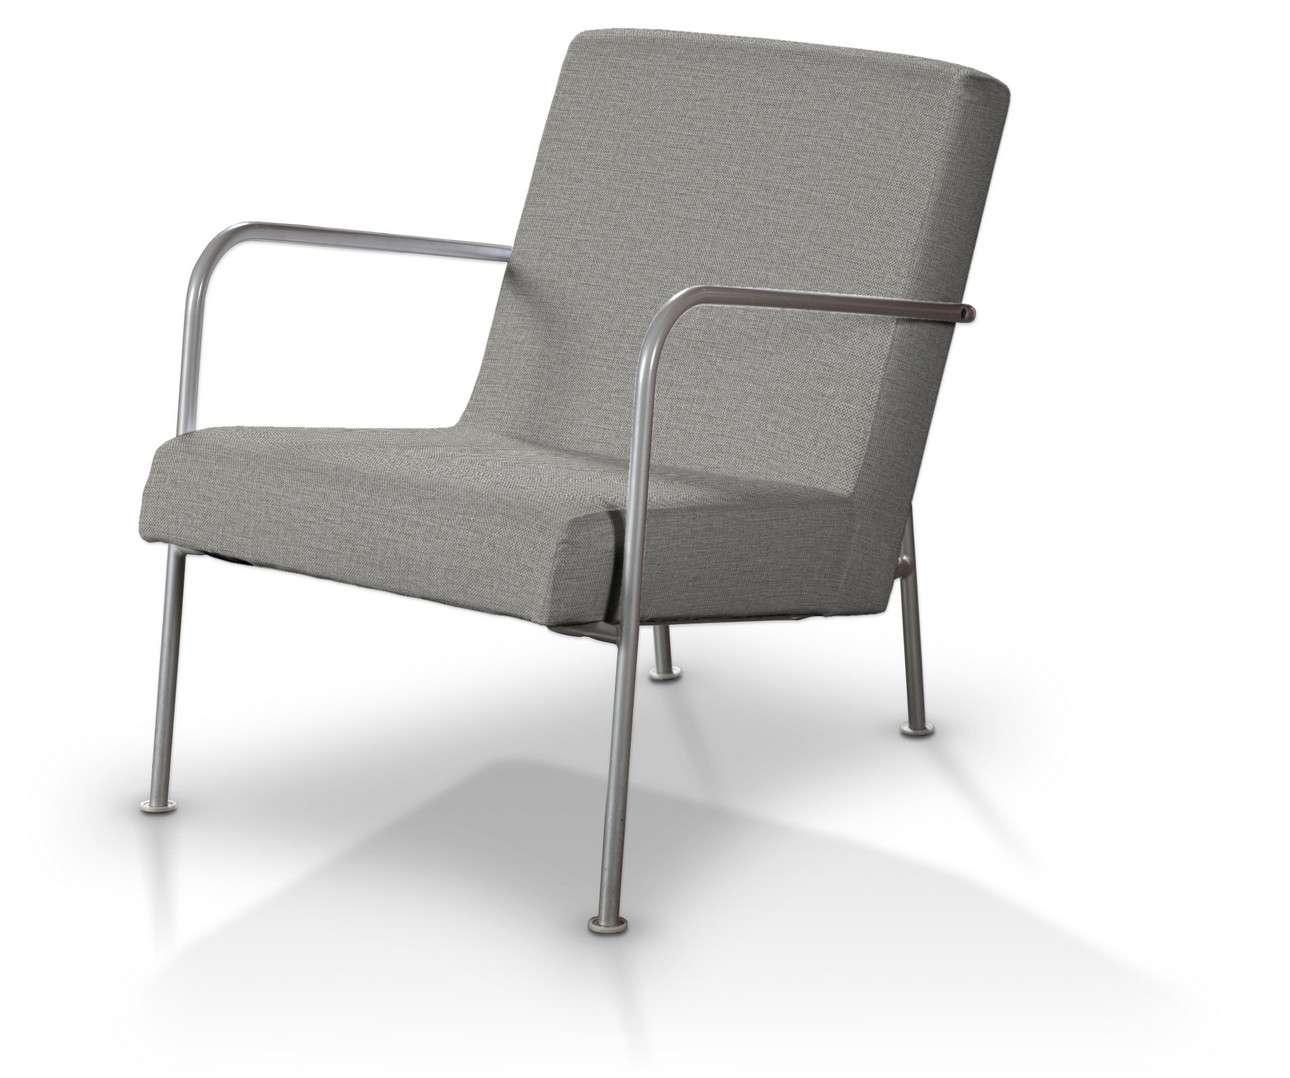 Pokrowiec na fotel Ikea PS w kolekcji Living II, tkanina: 160-89